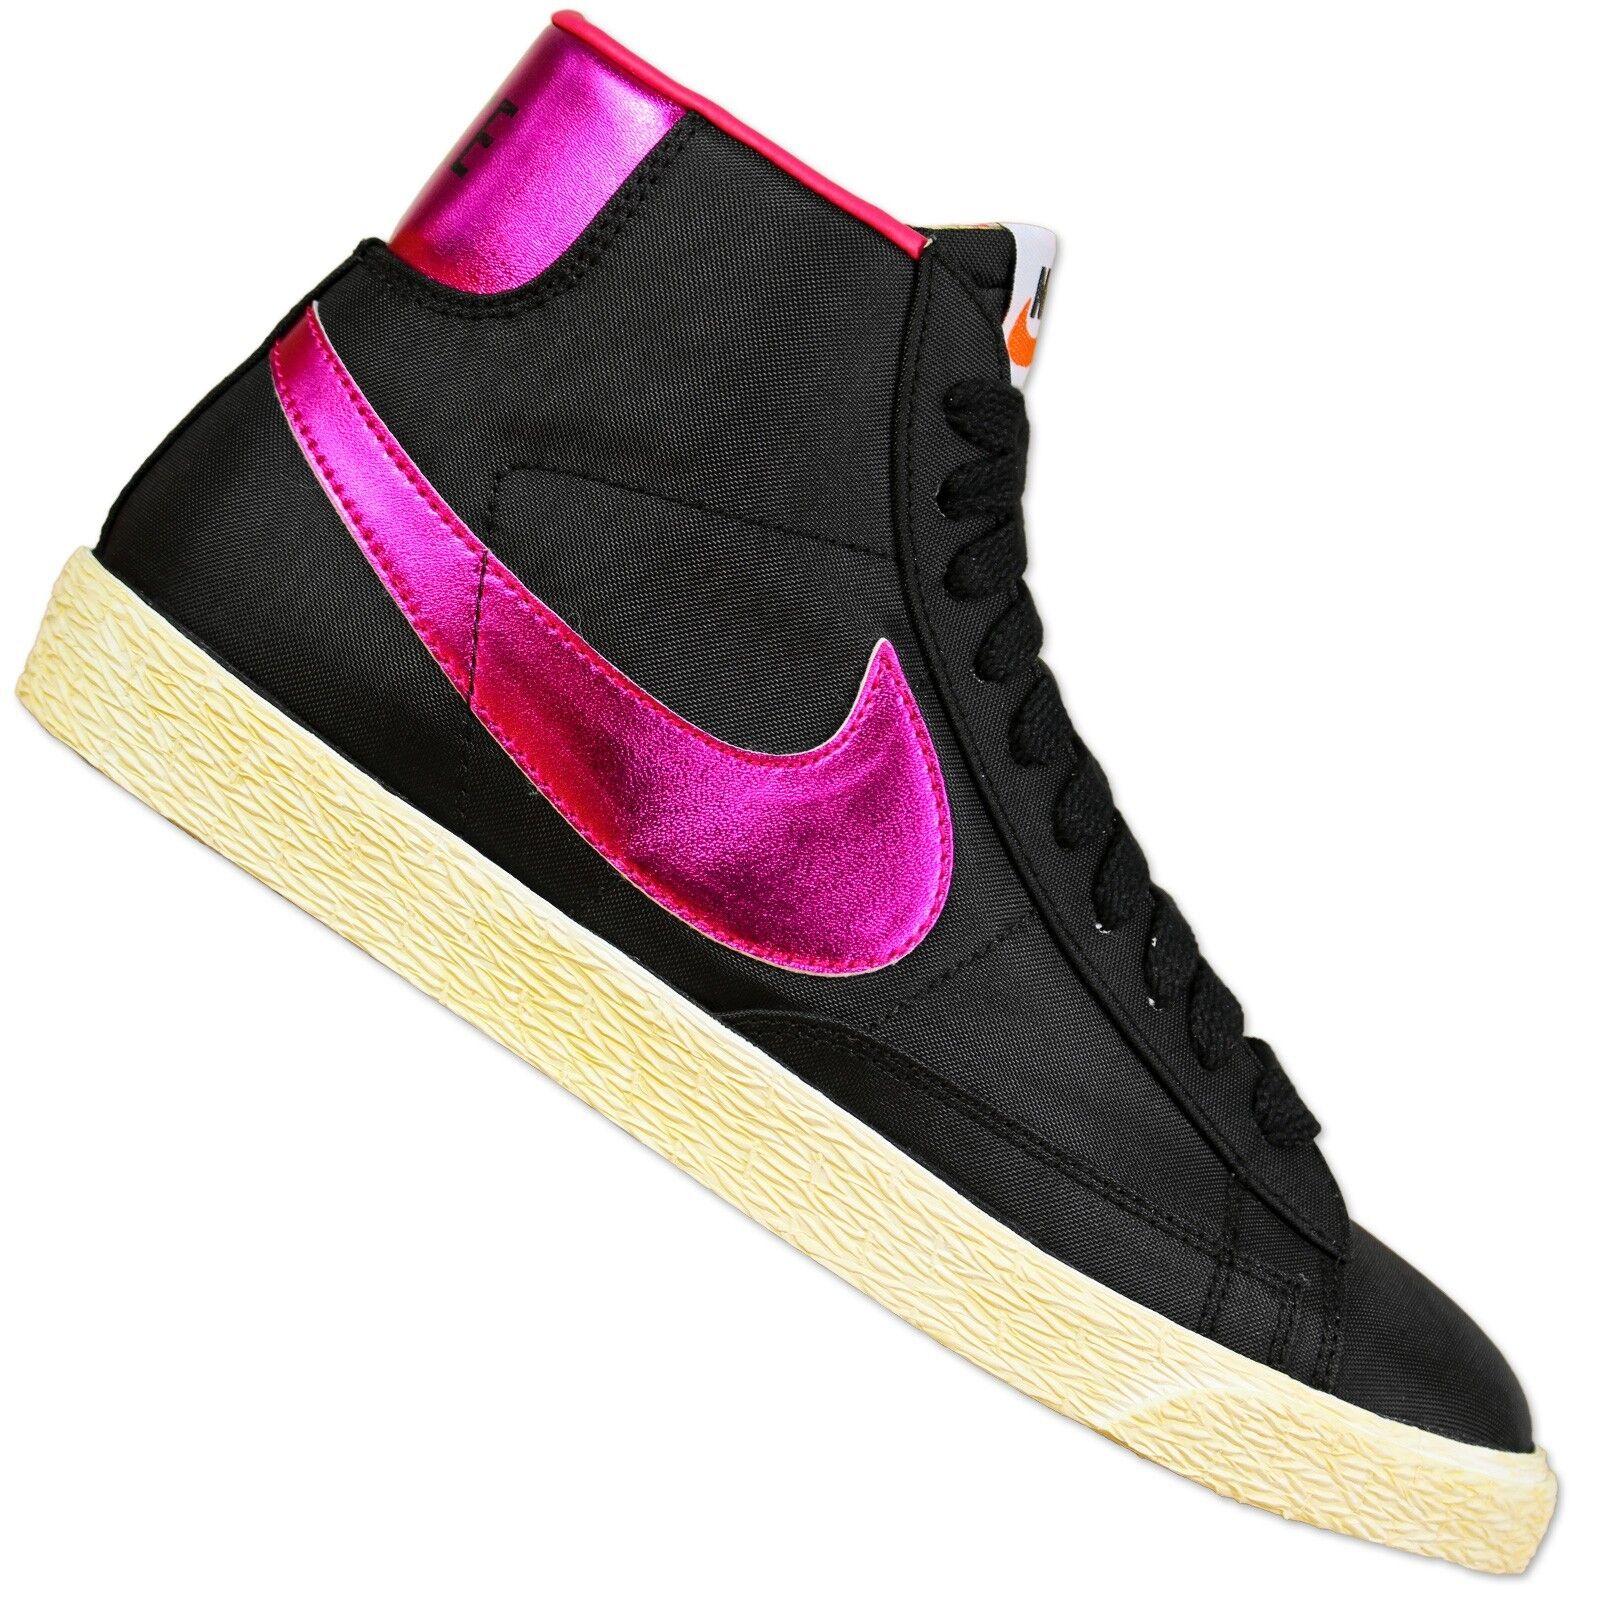 NIKE Donna BLAZER HIGH Oldschool VINTAGE scarpa tempo libero Oldschool HIGH Sneaker Nero Viola 84c430